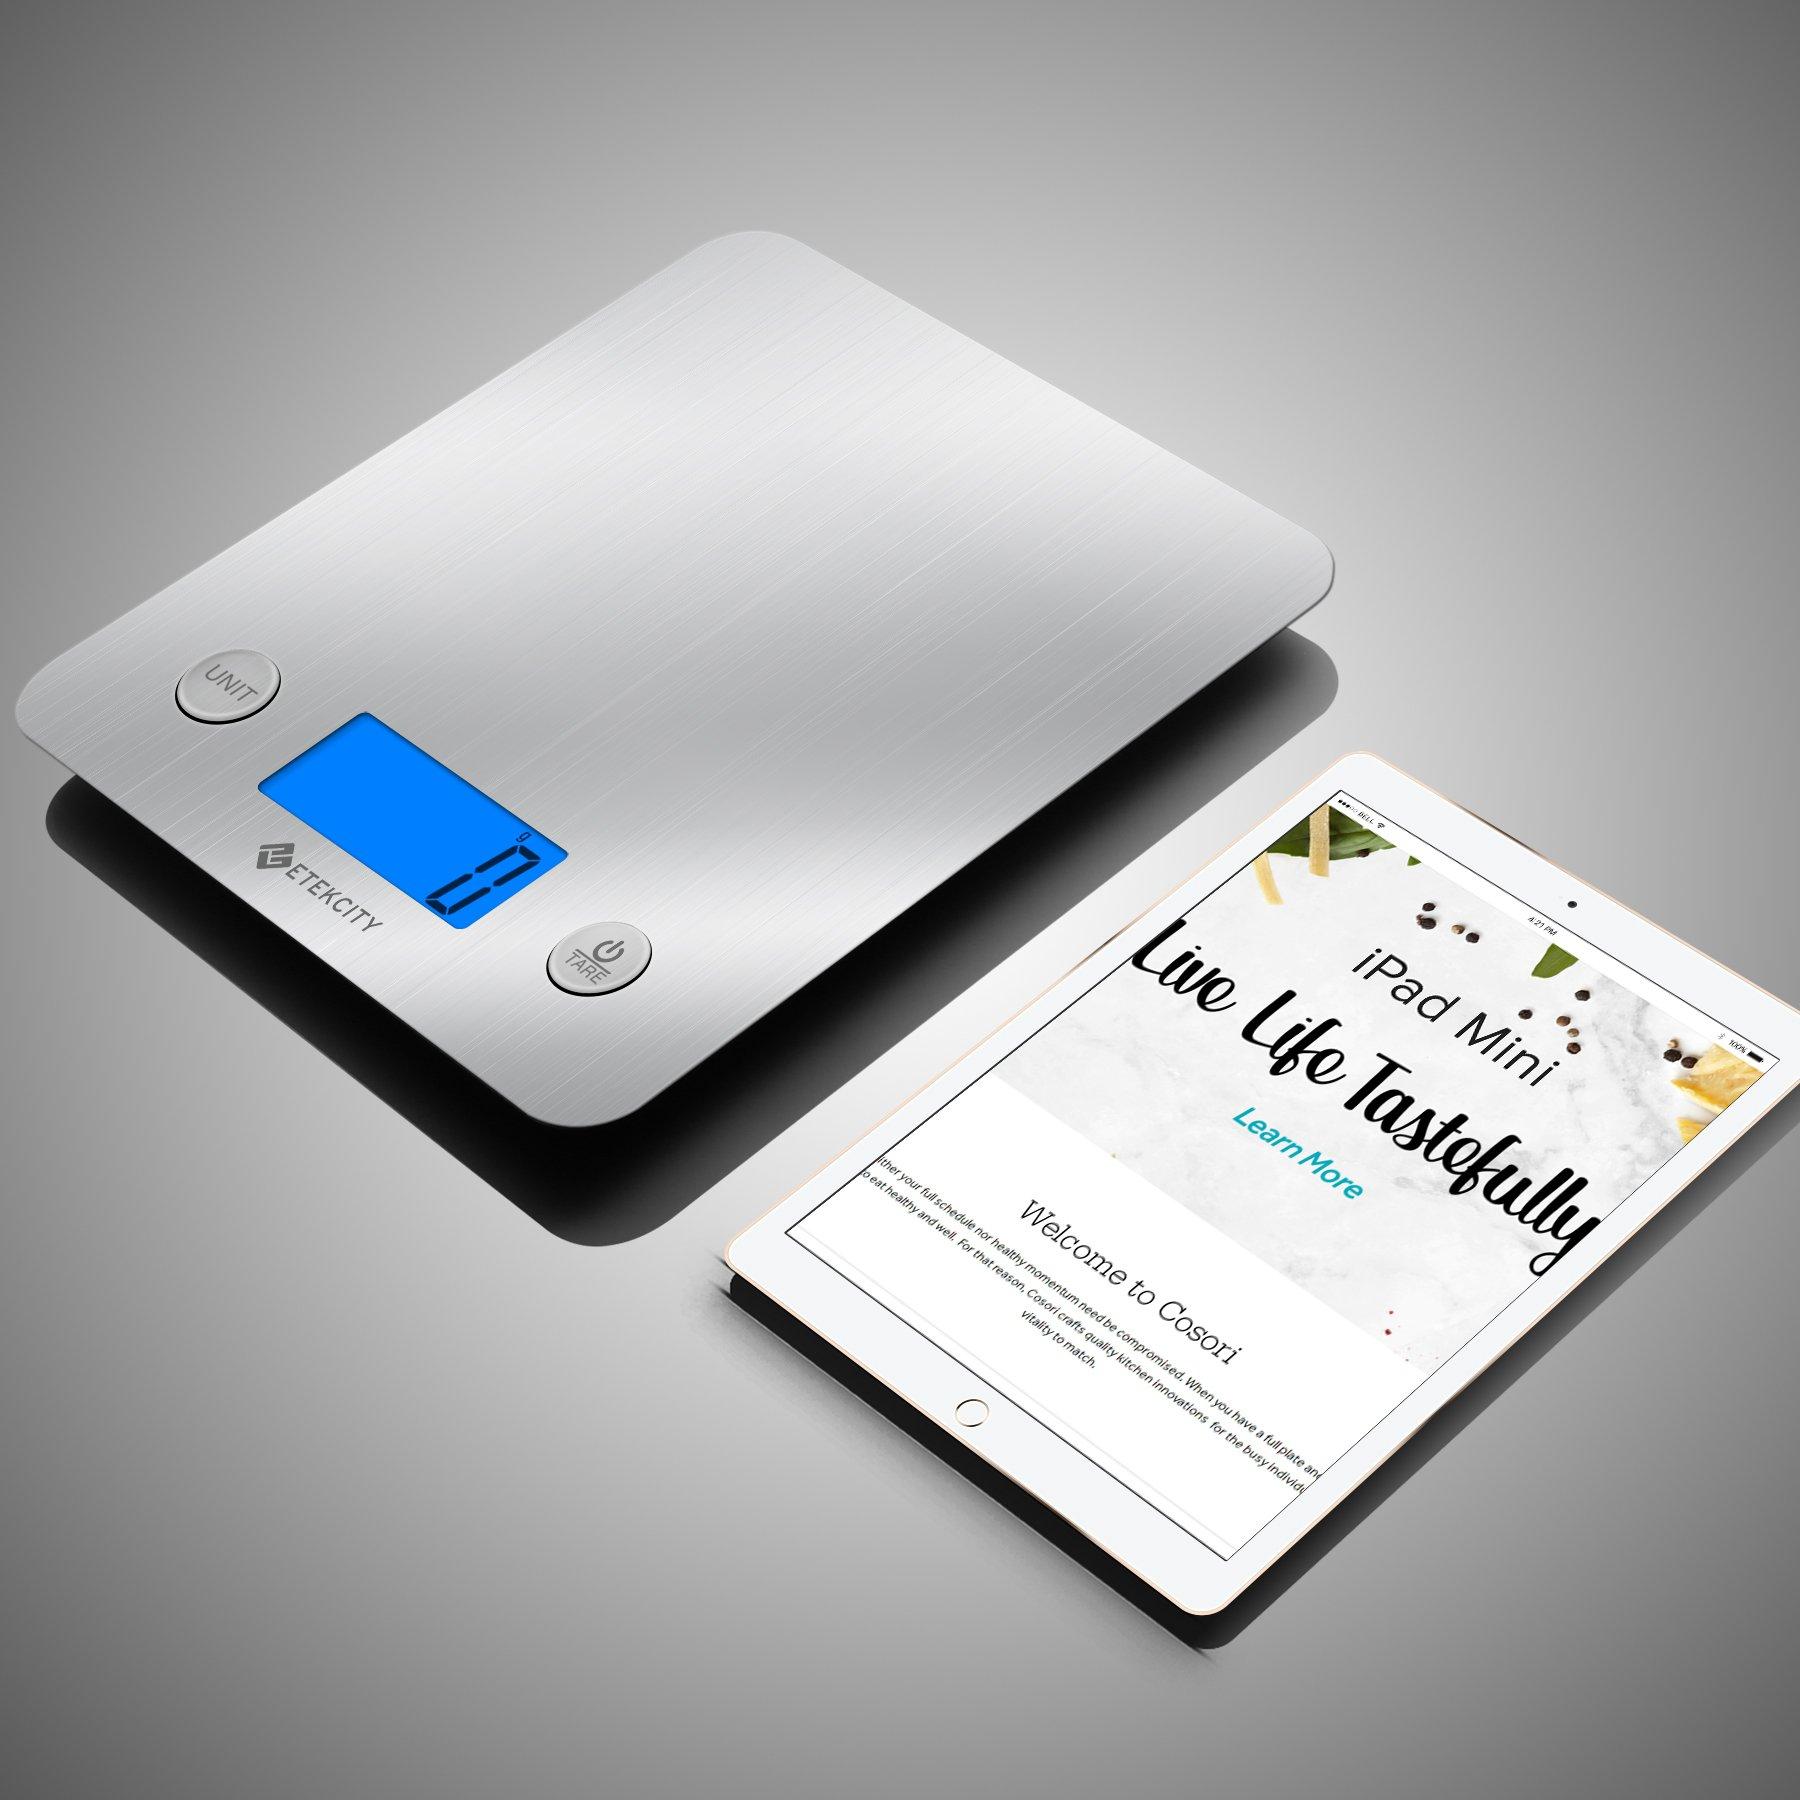 Etekcity EK6211 Digital Kitchen Multifunction Food Scale with Large Platform 11lb 5kg, Batteries Included (Stainless Steel) by Etekcity (Image #5)